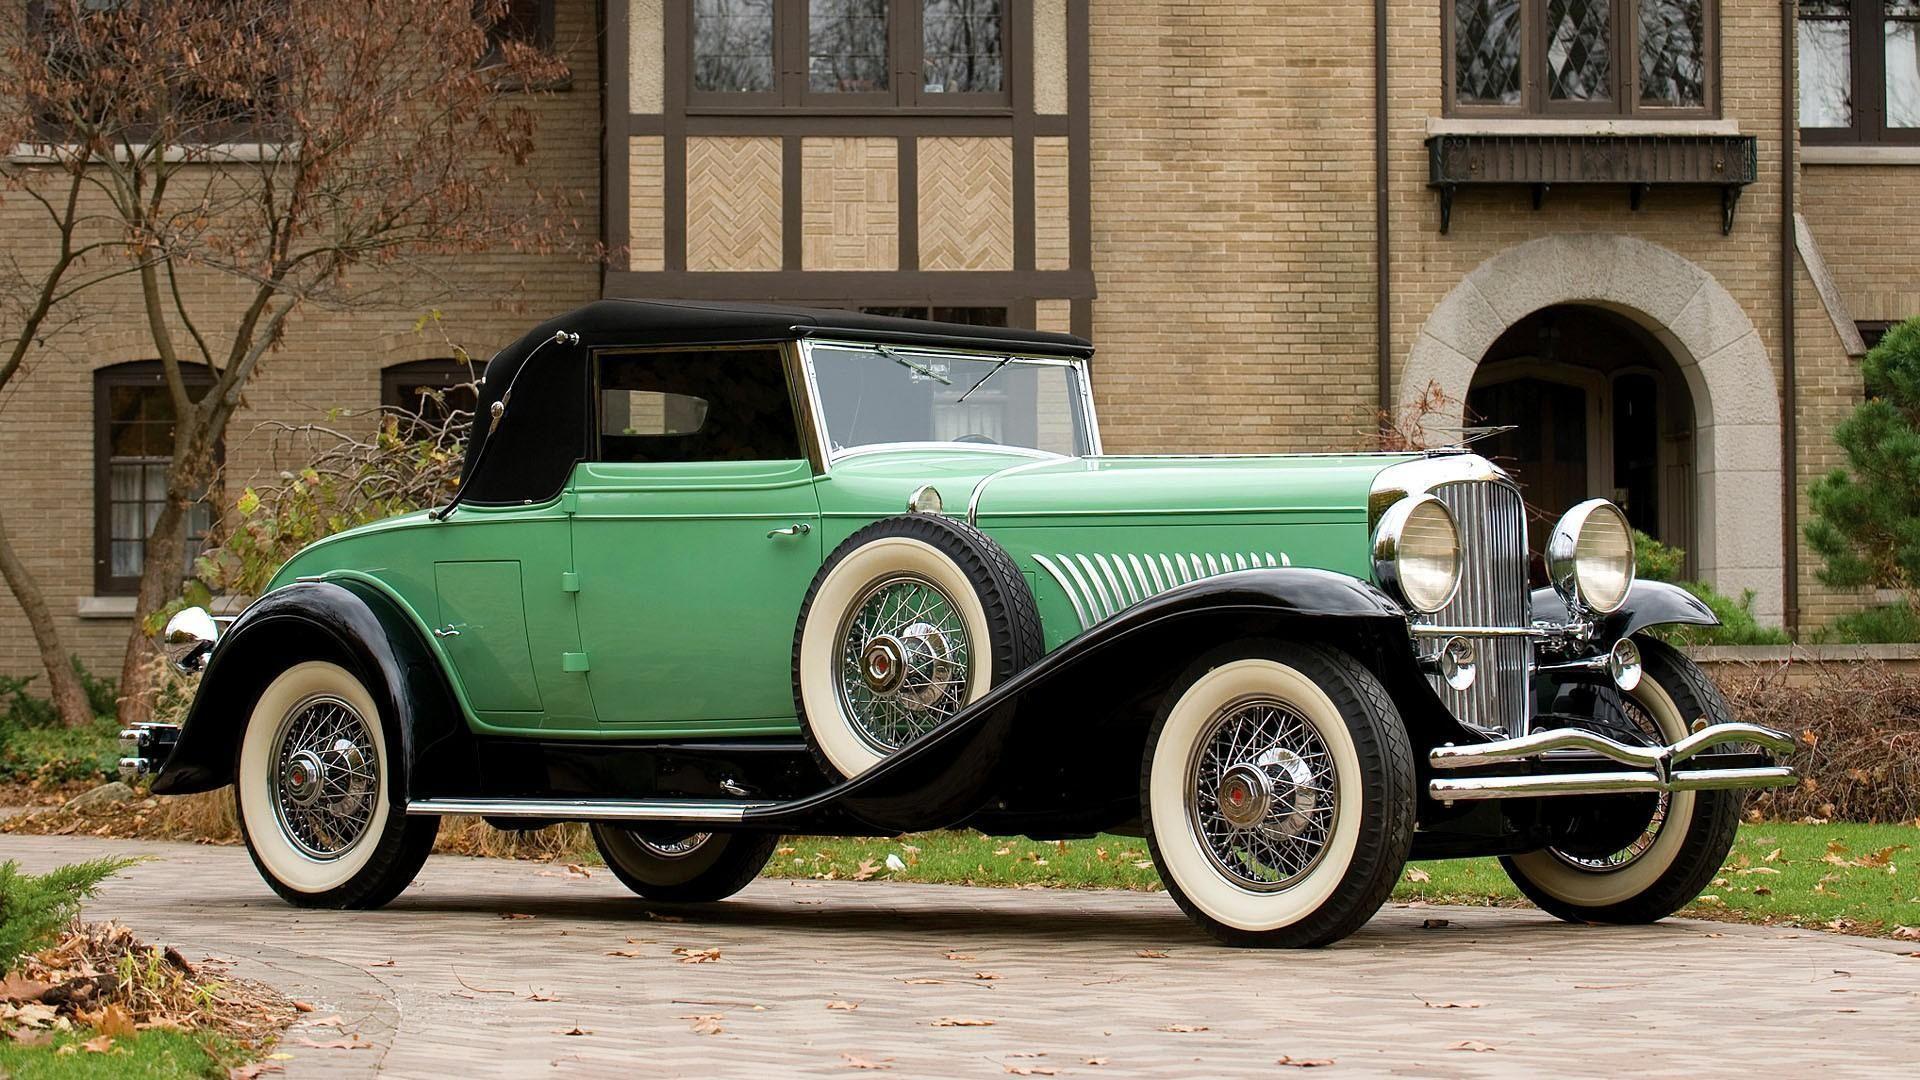 1929 Duesenberg Model J Vintage Cars Best American Cars Coupe Cars